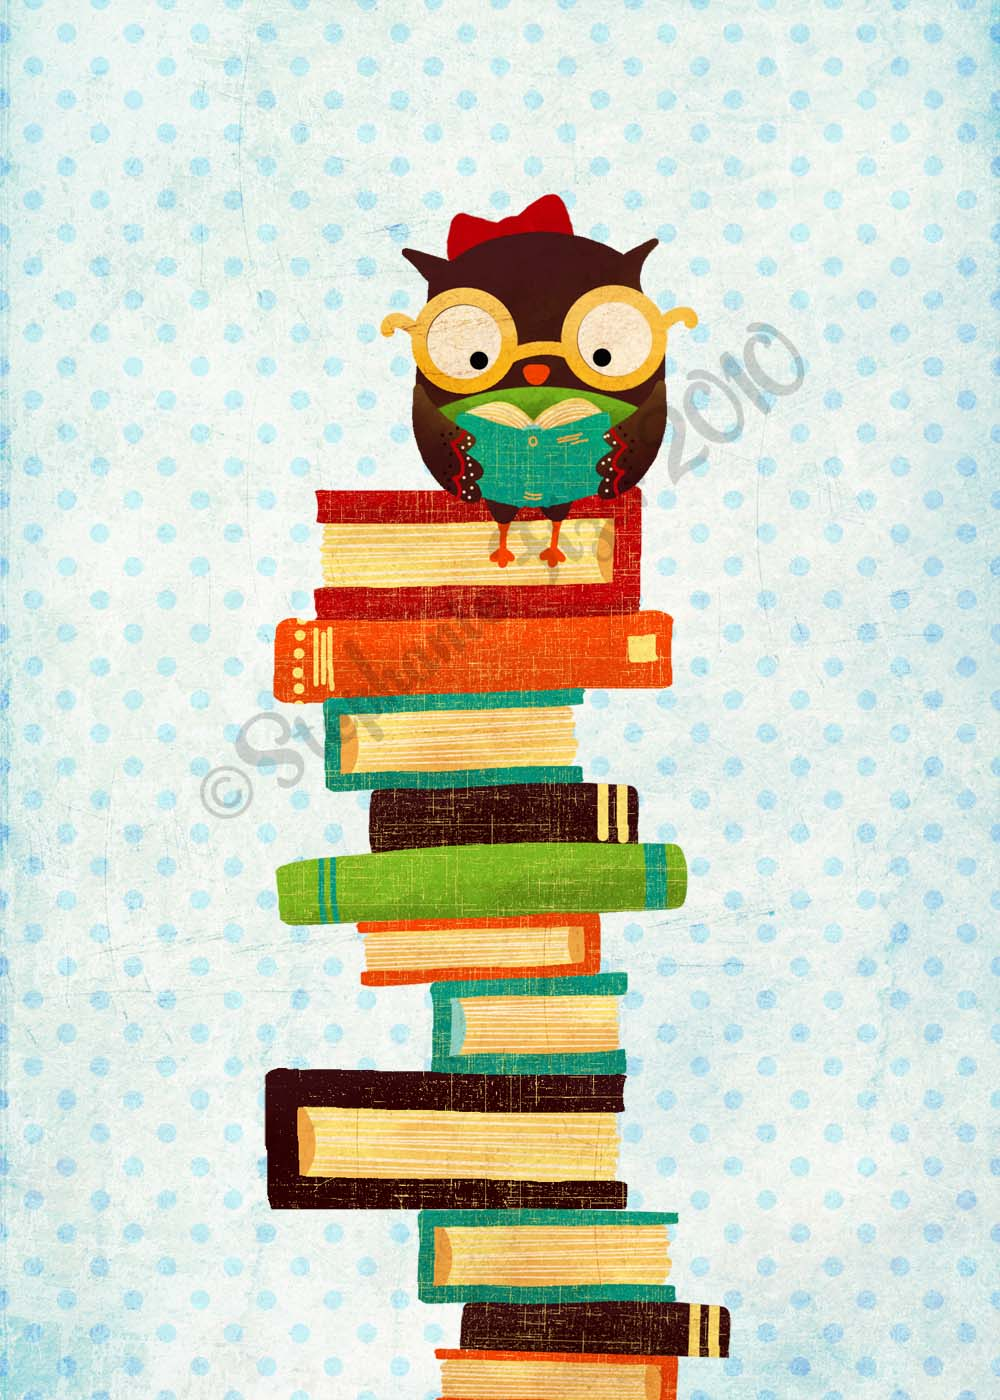 Bookish Owl Too